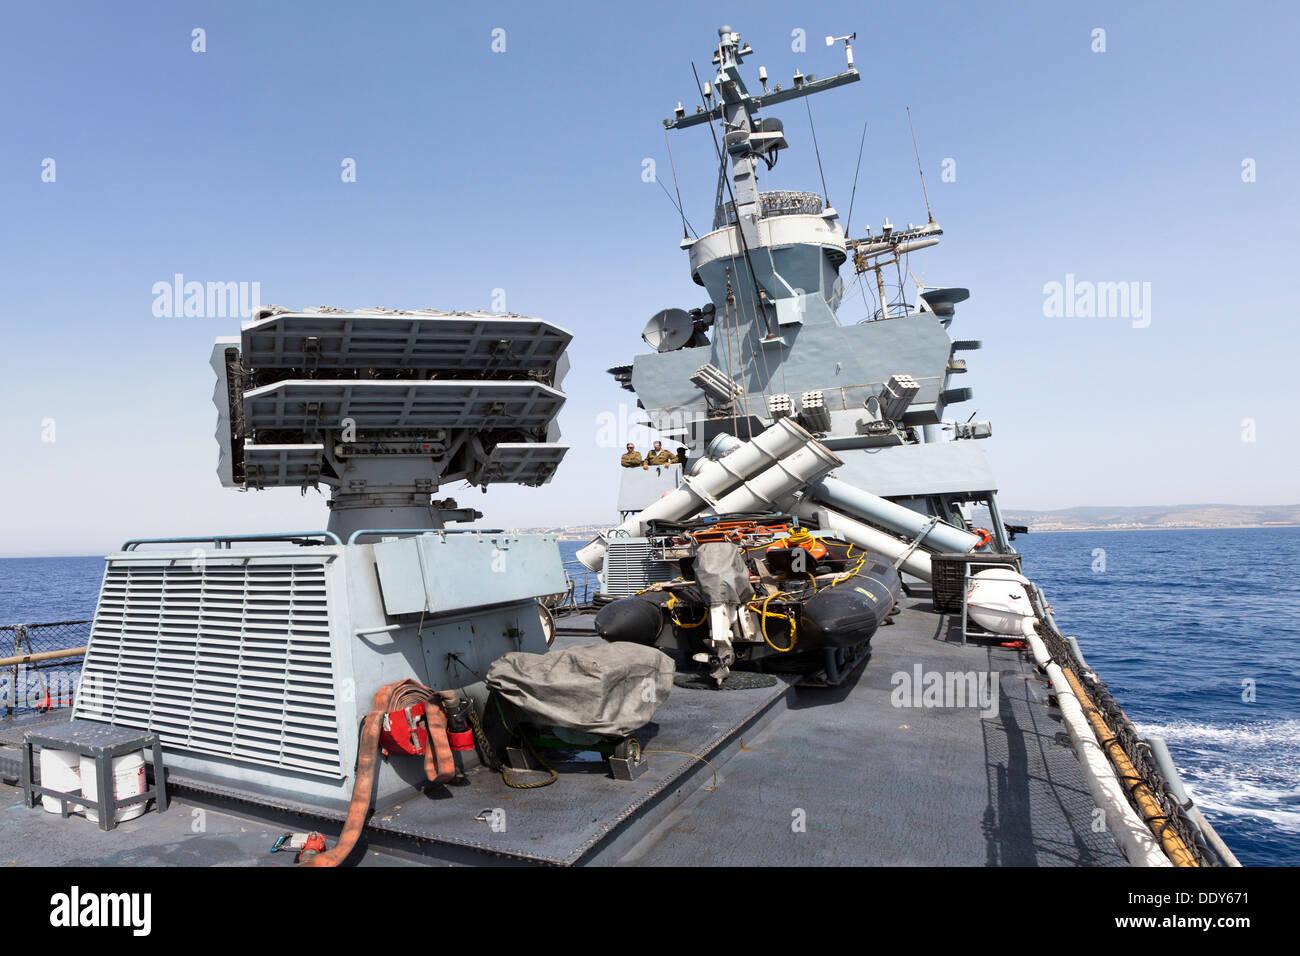 Israeli Navy Ship Stock Photos & Israeli Navy Ship Stock